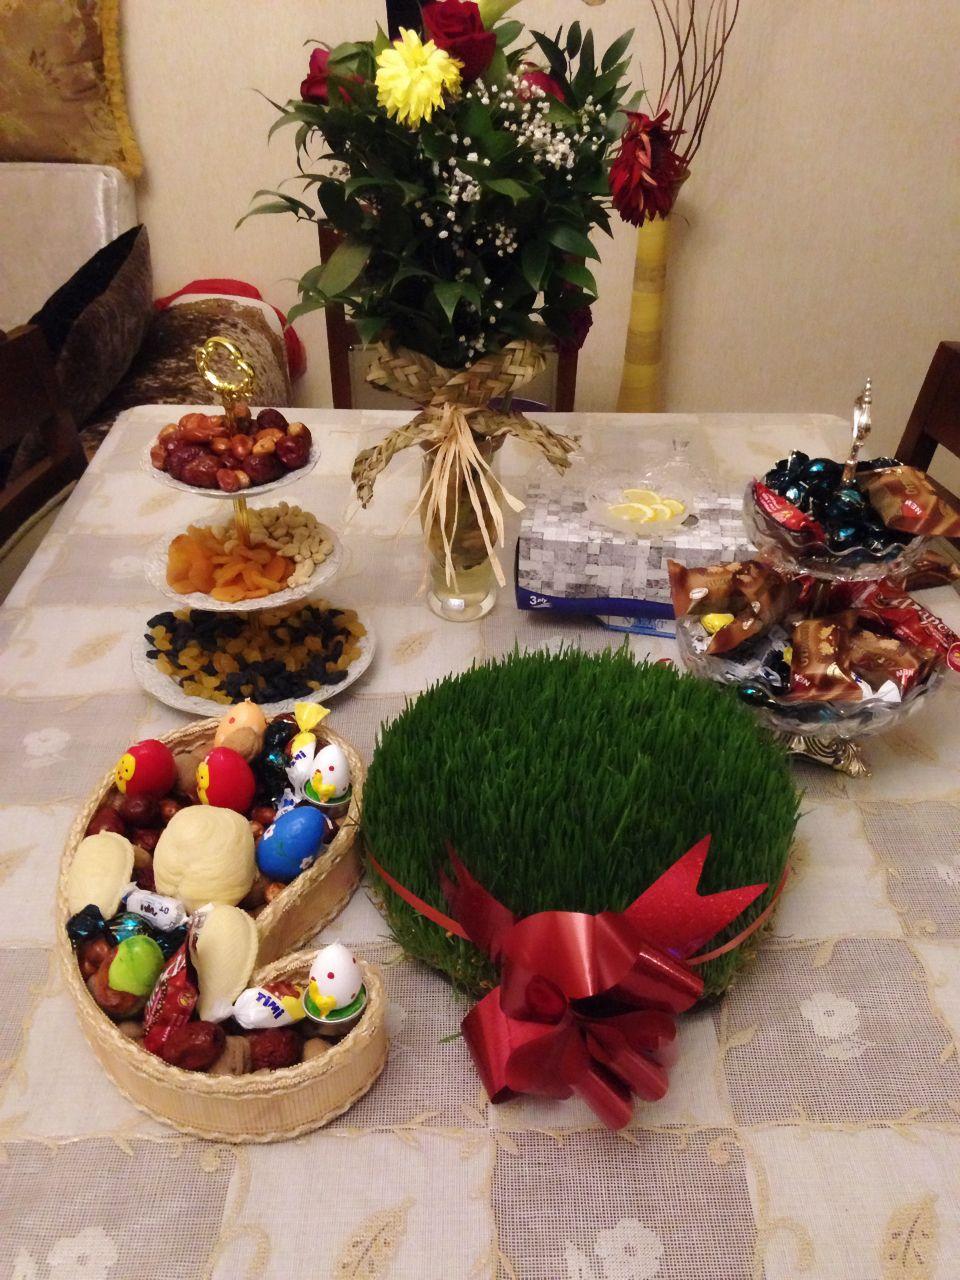 Novruz Bayrami Table Decorations Nowruz Decor